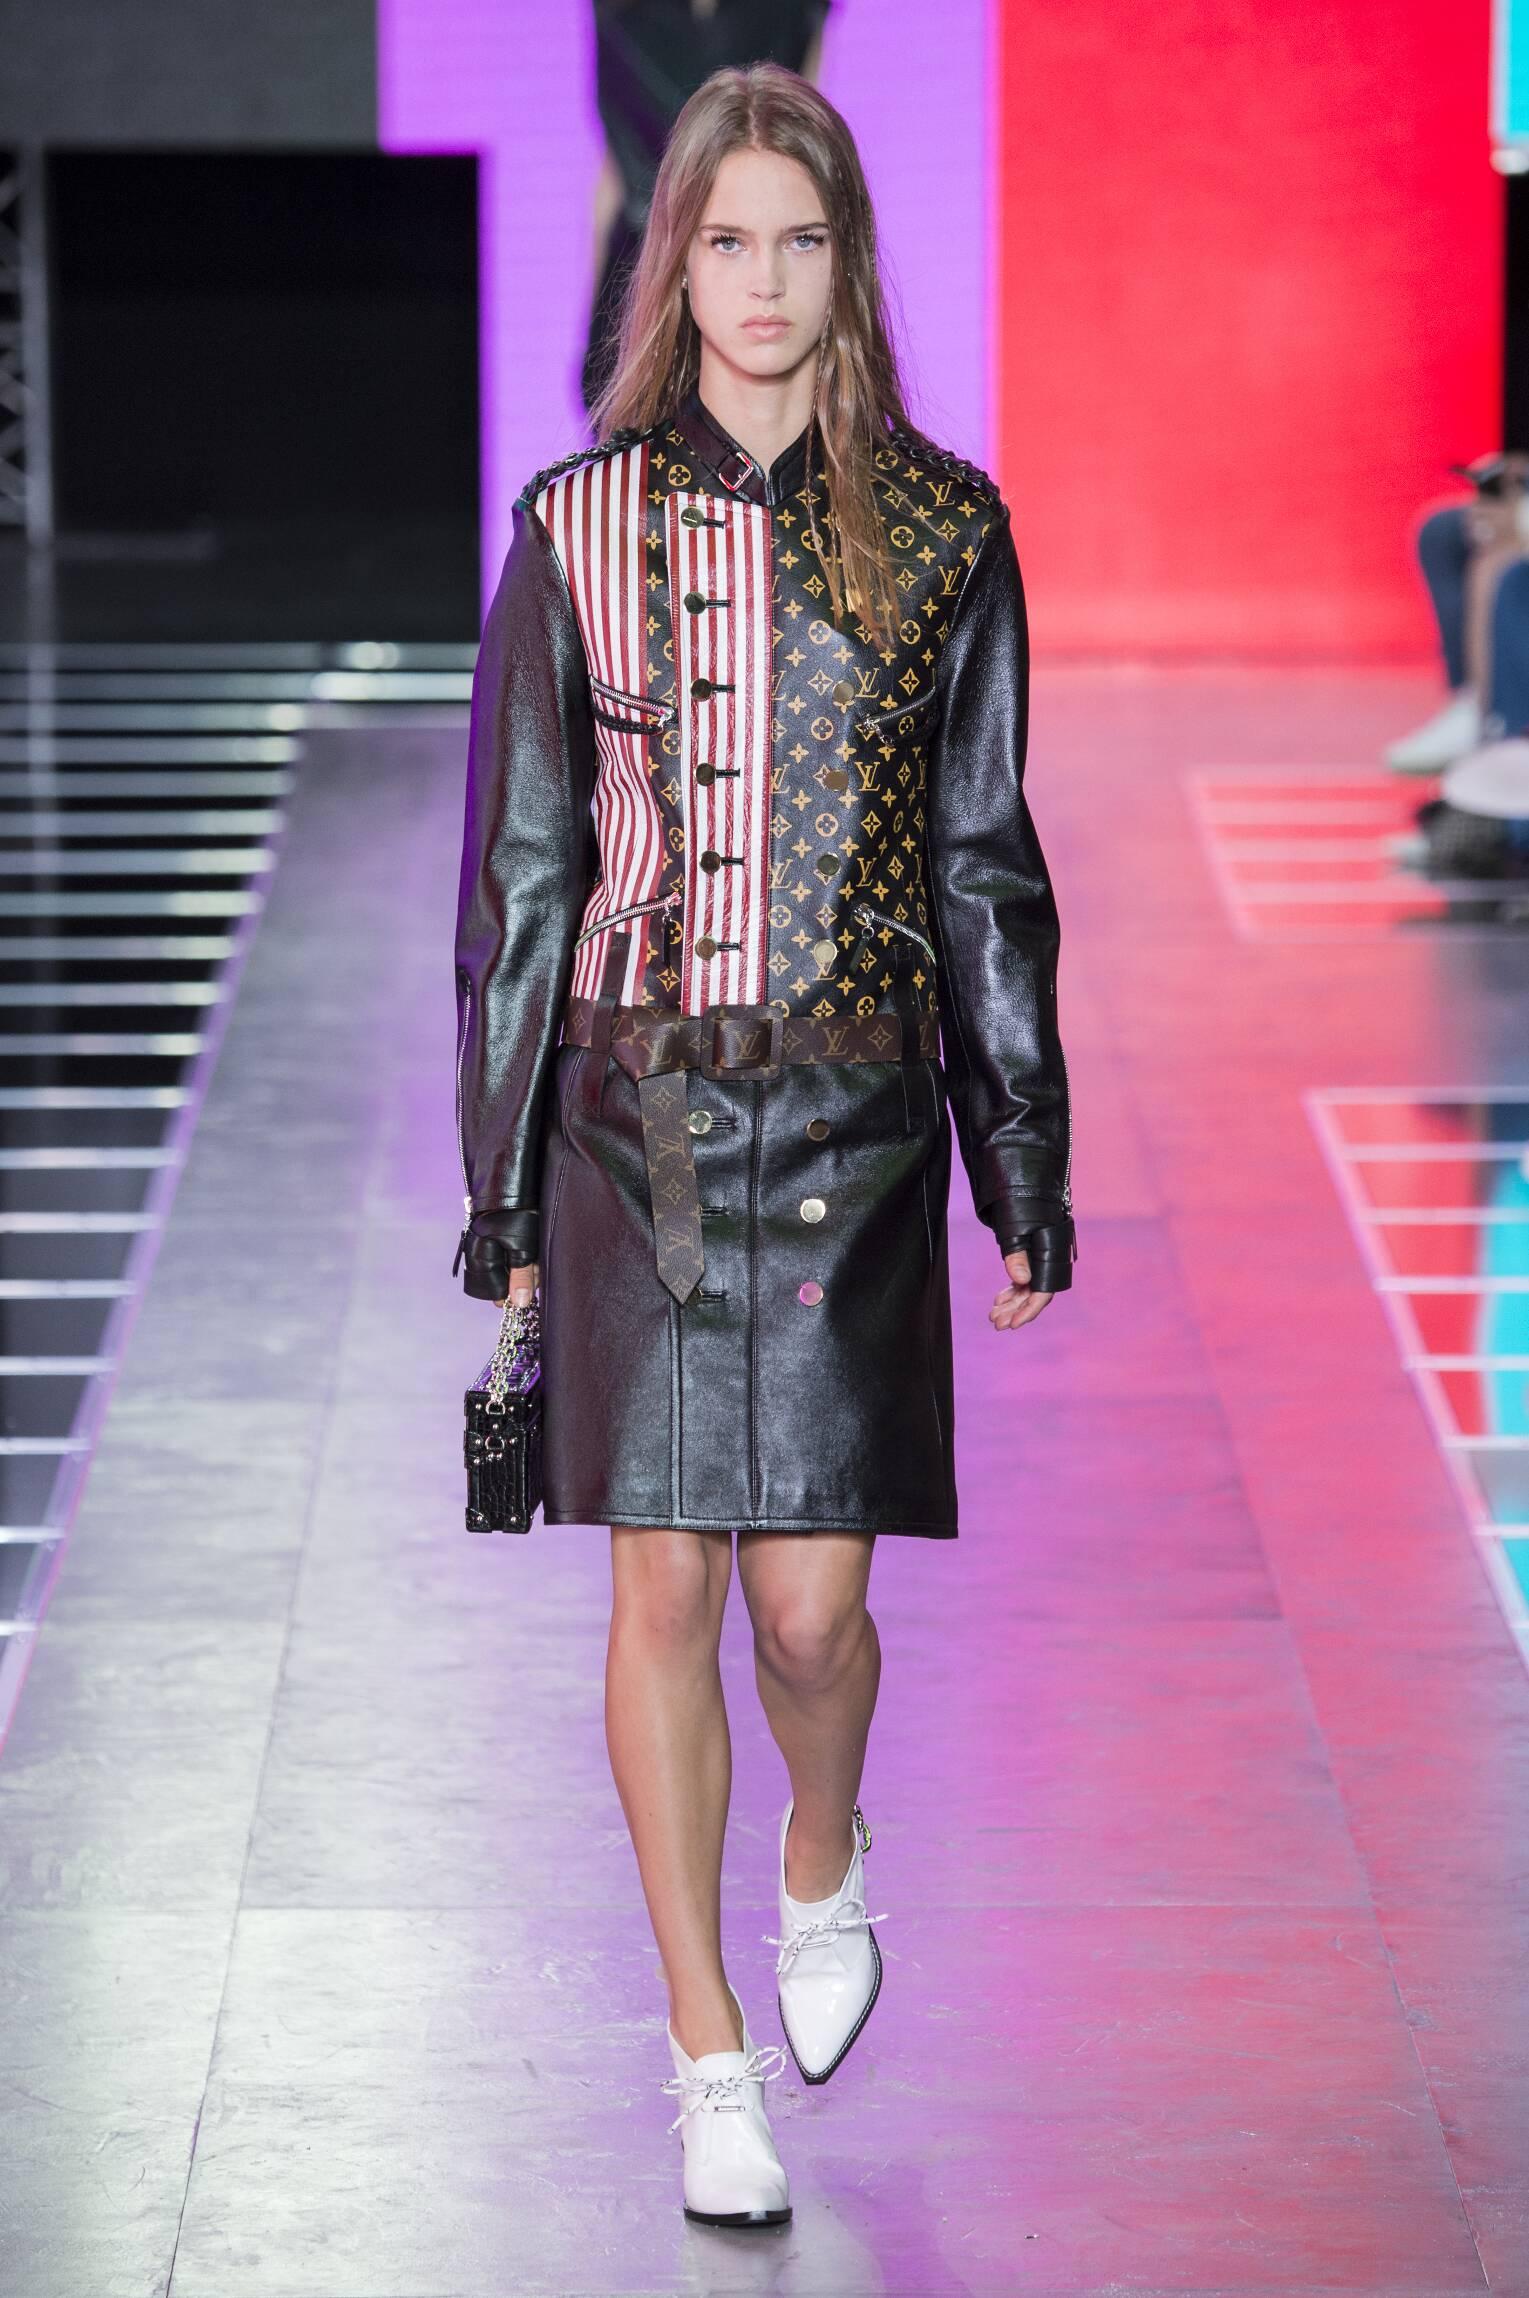 2016 Louis Vuitton Spring Catwalk